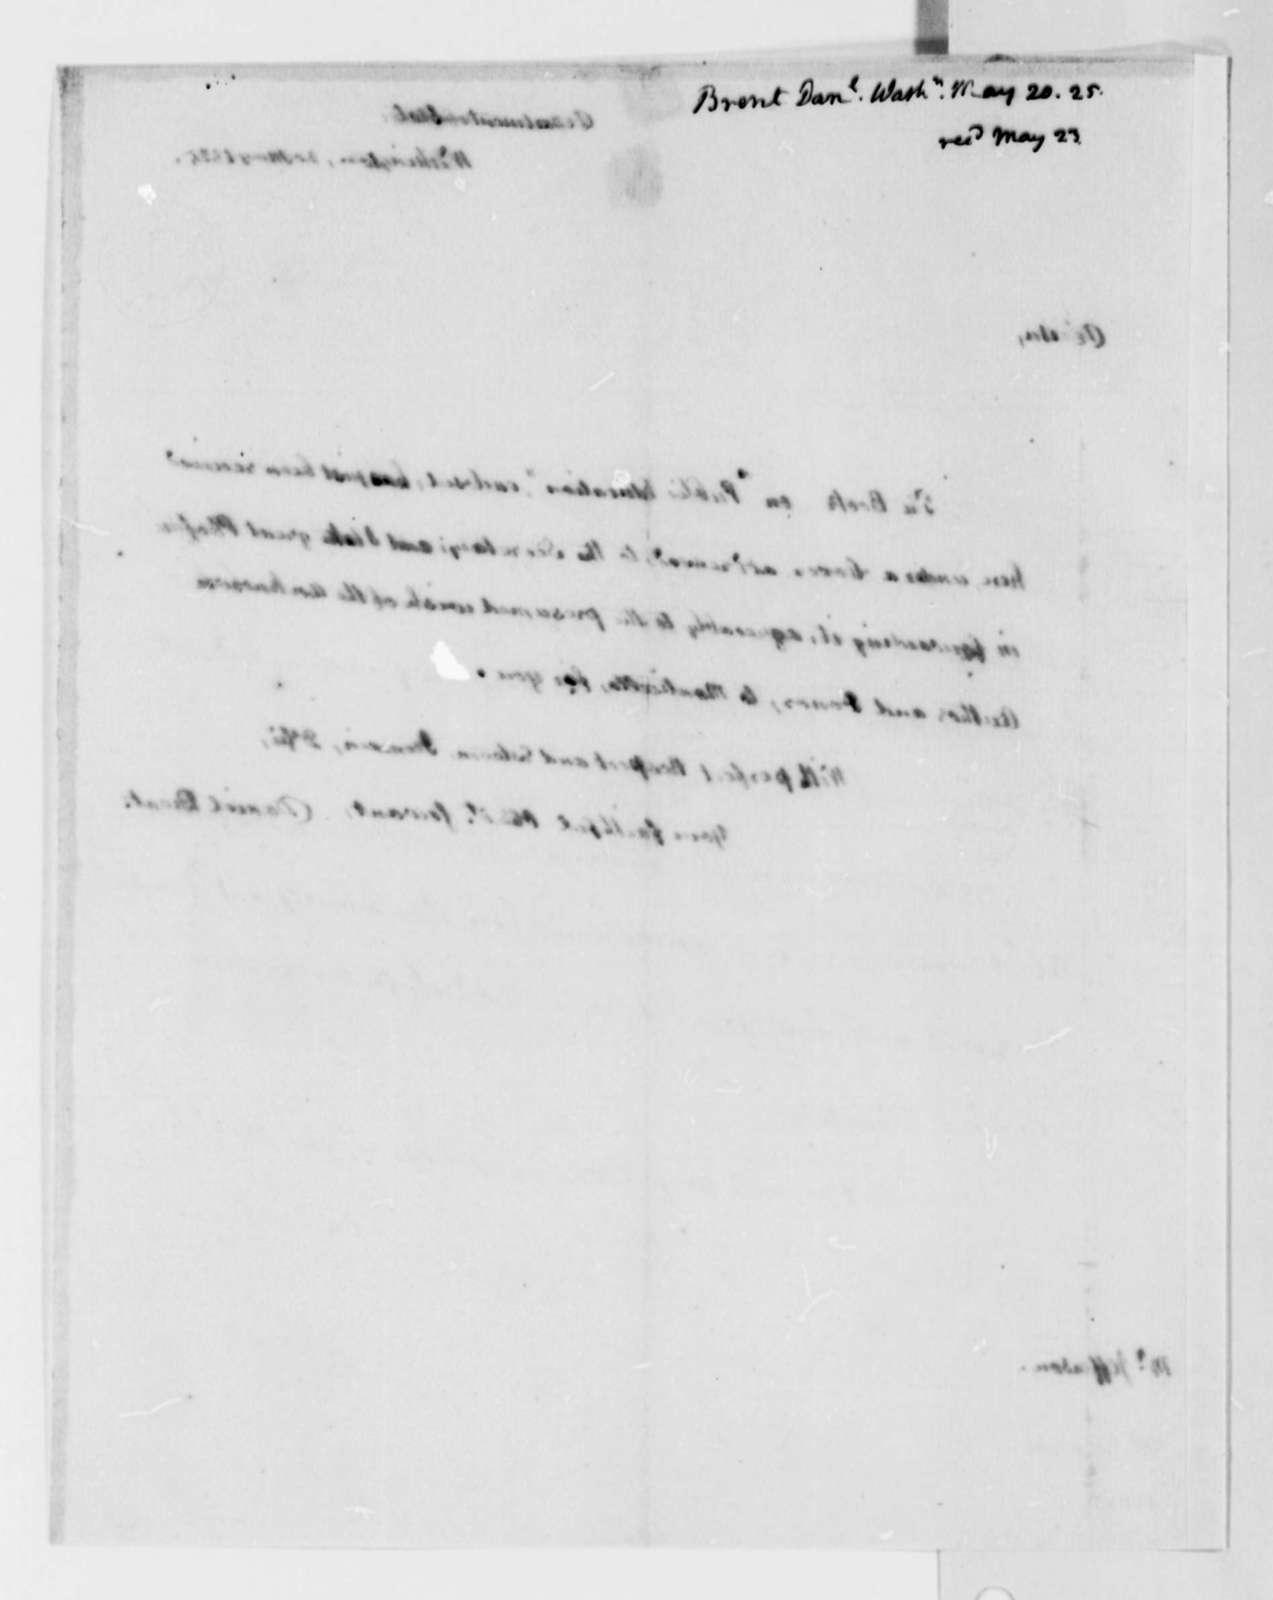 Daniel C. Brent to Thomas Jefferson, May 20, 1825